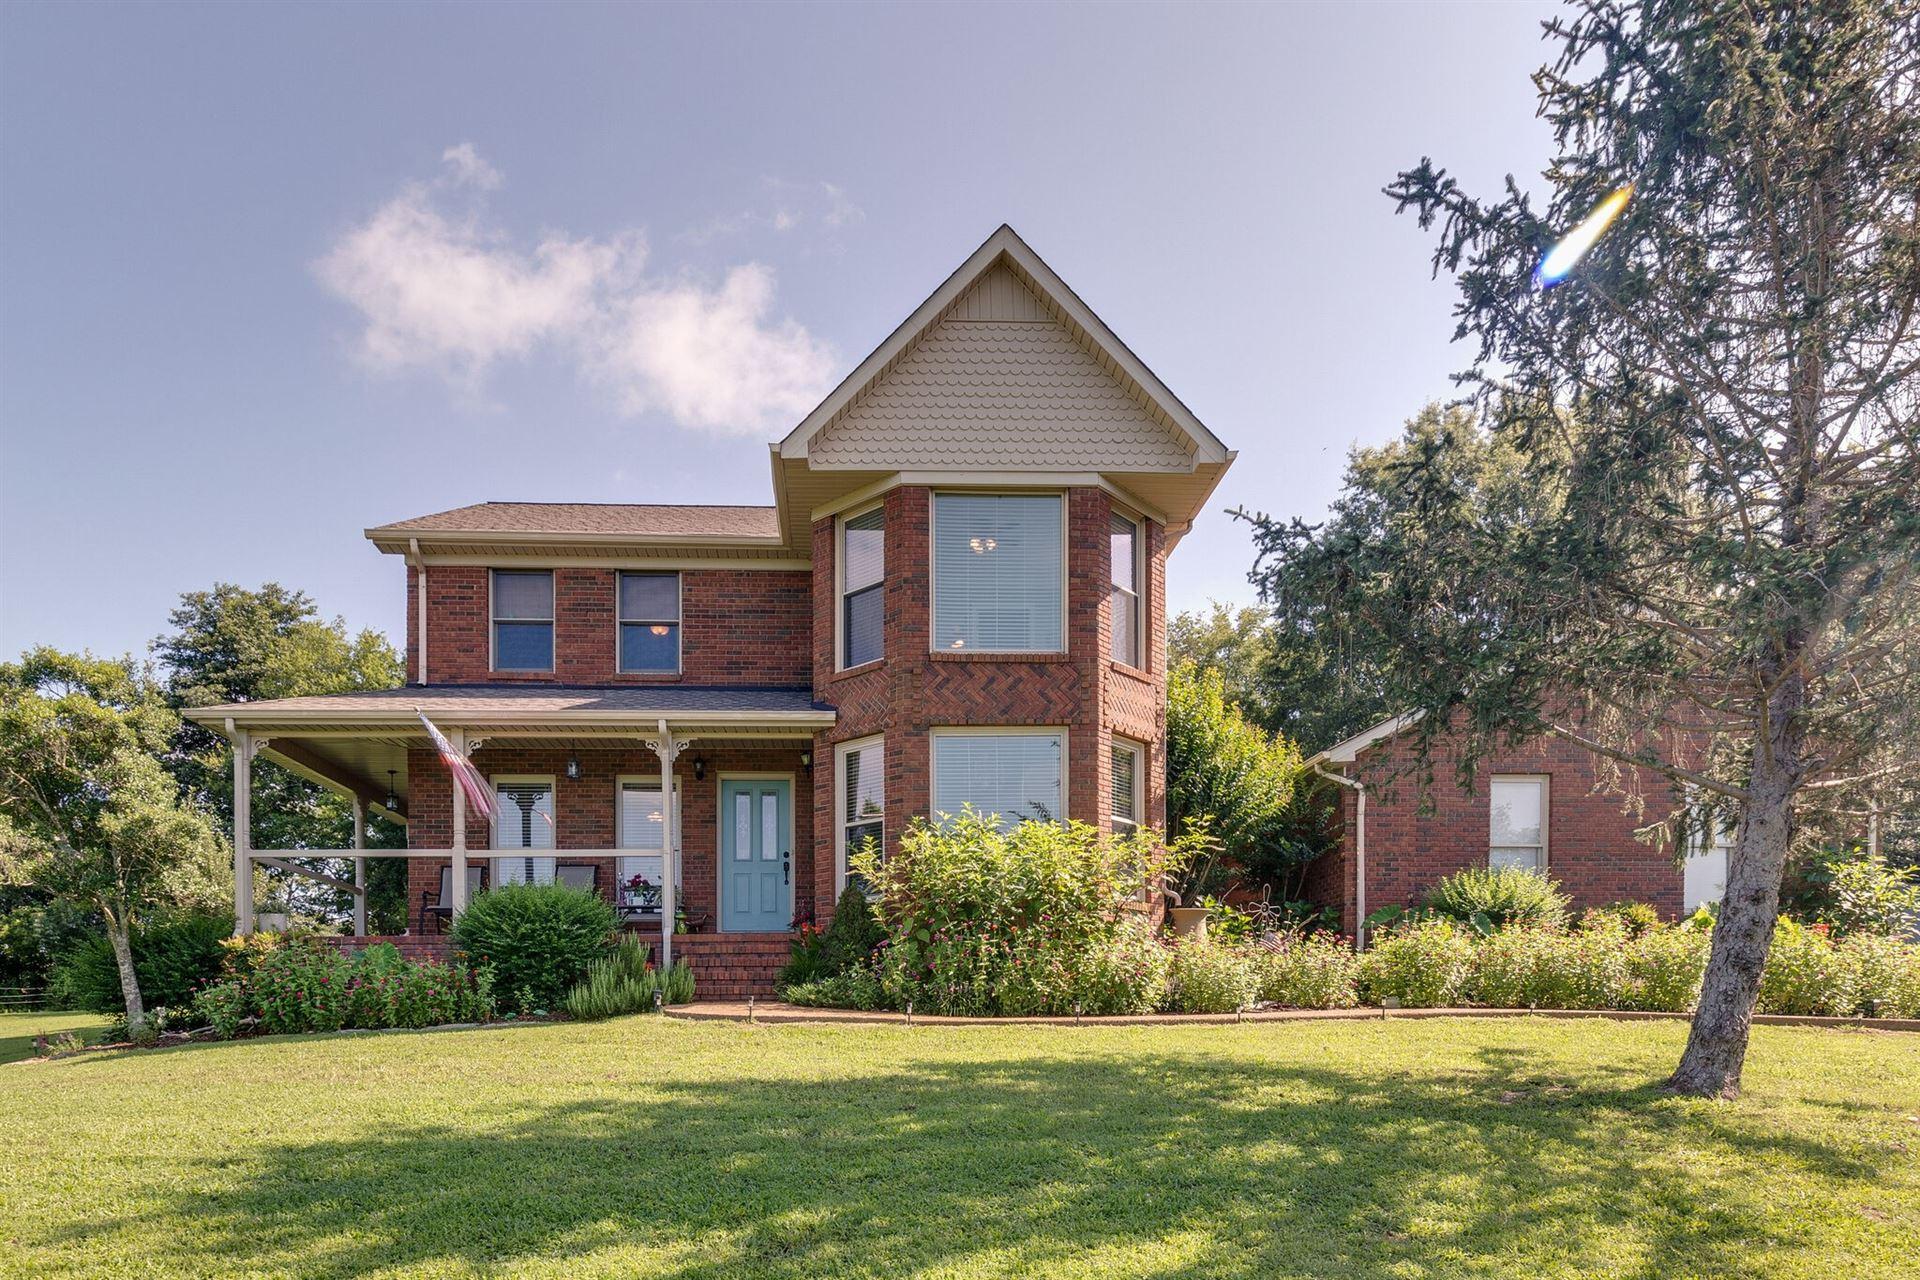 1606 Collins Hollow Rd, Lewisburg, TN 37091 - MLS#: 2169873